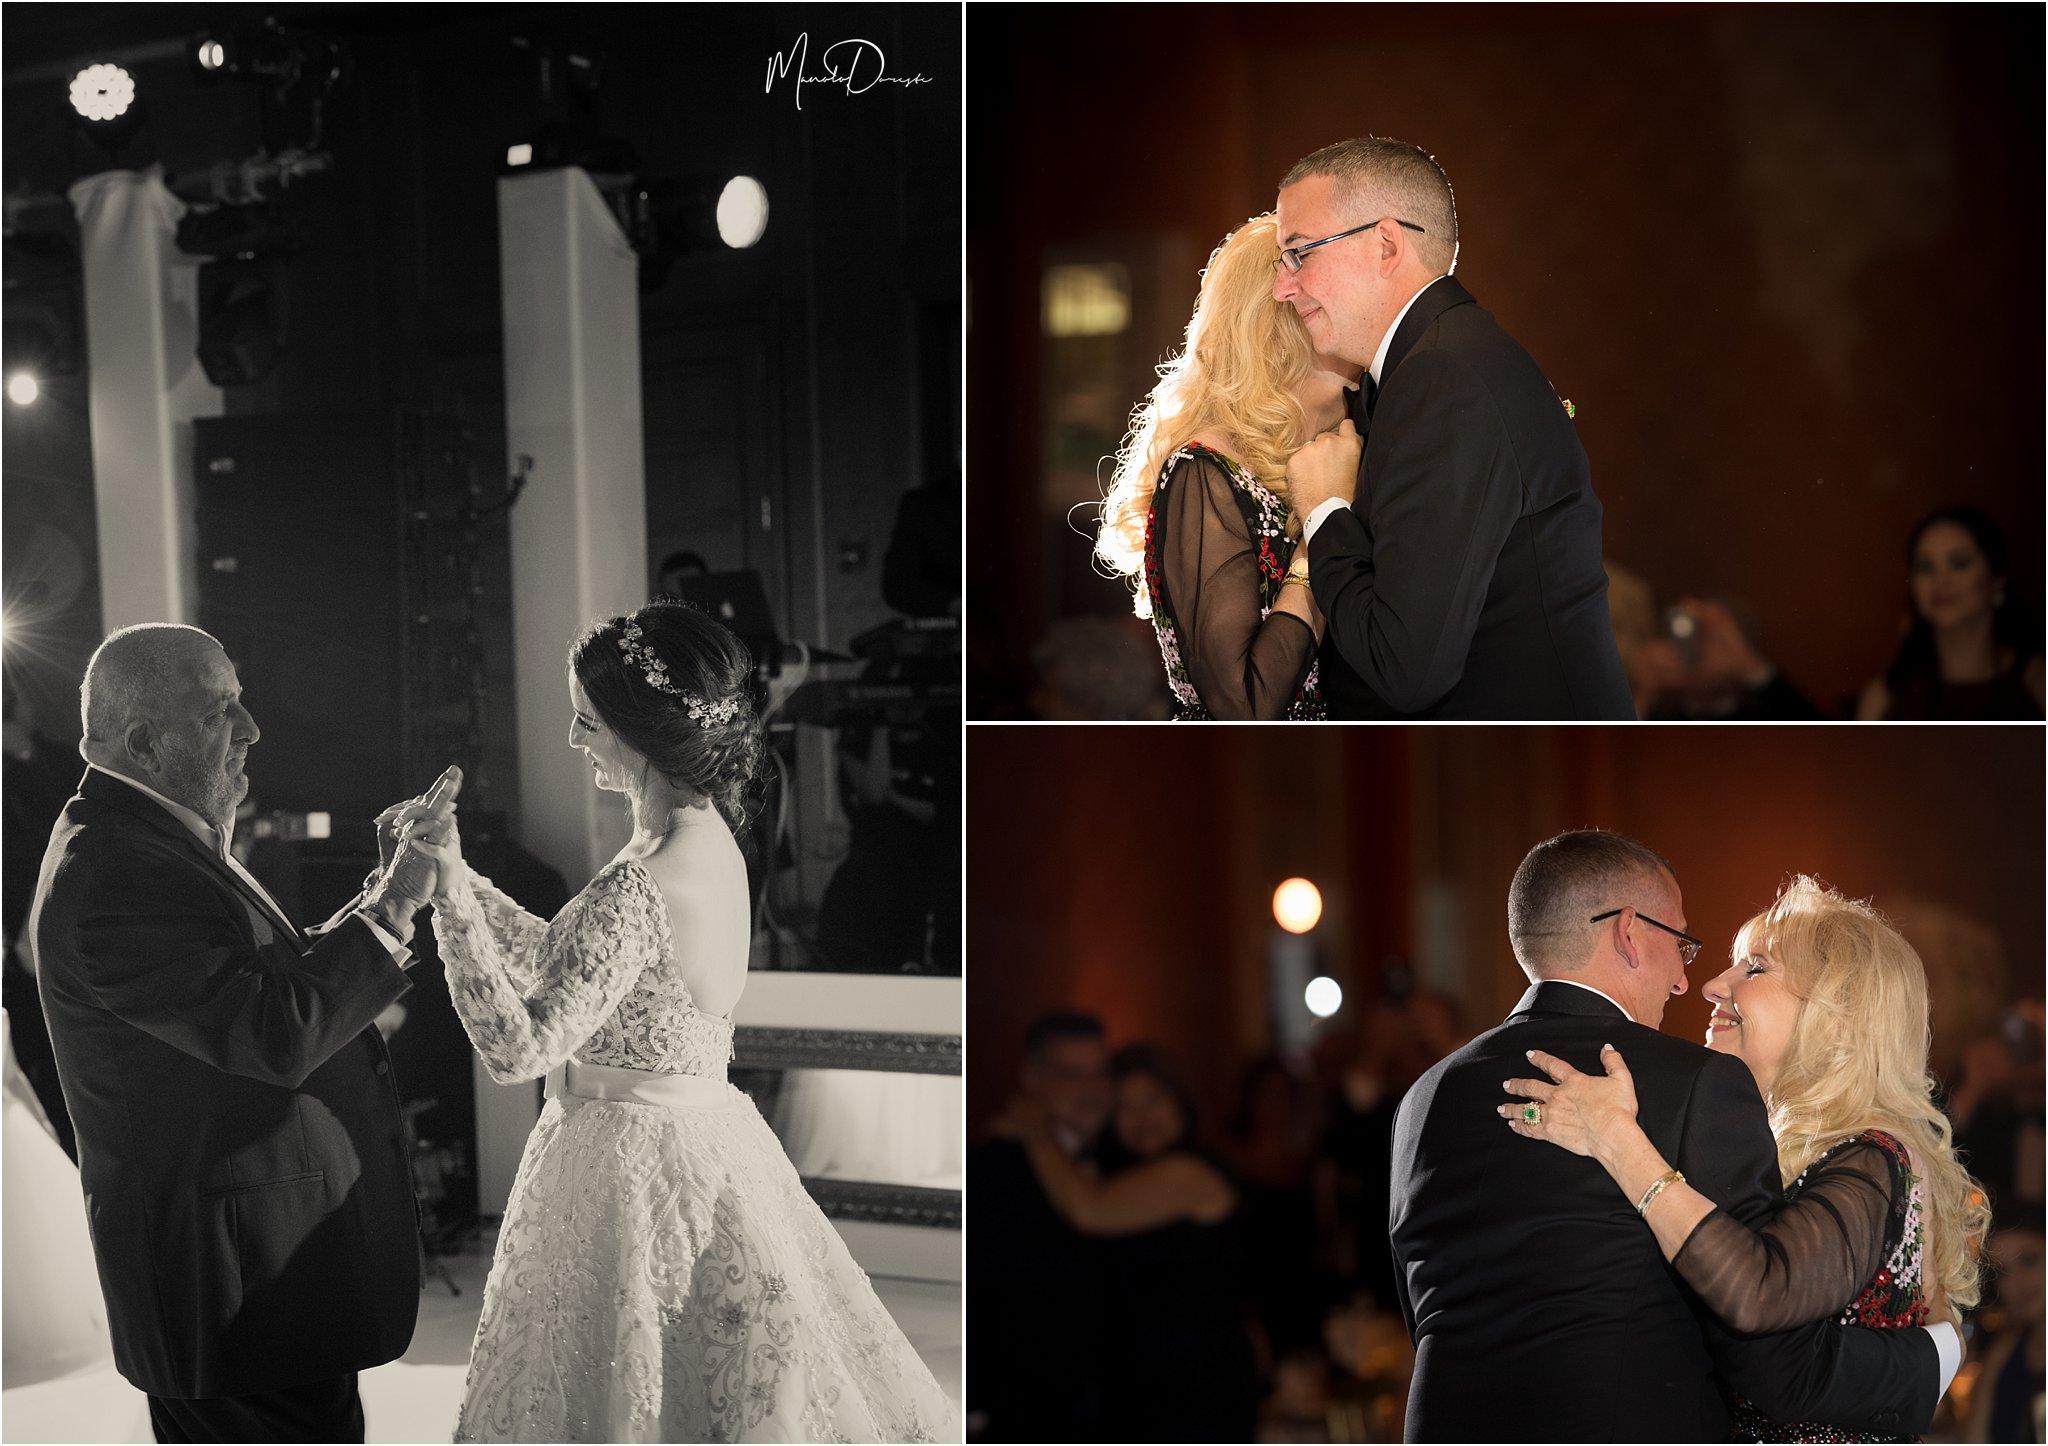 00732_ManoloDoreste_InFocusStudios_Wedding_Family_Photography_Miami_MiamiPhotographer.jpg